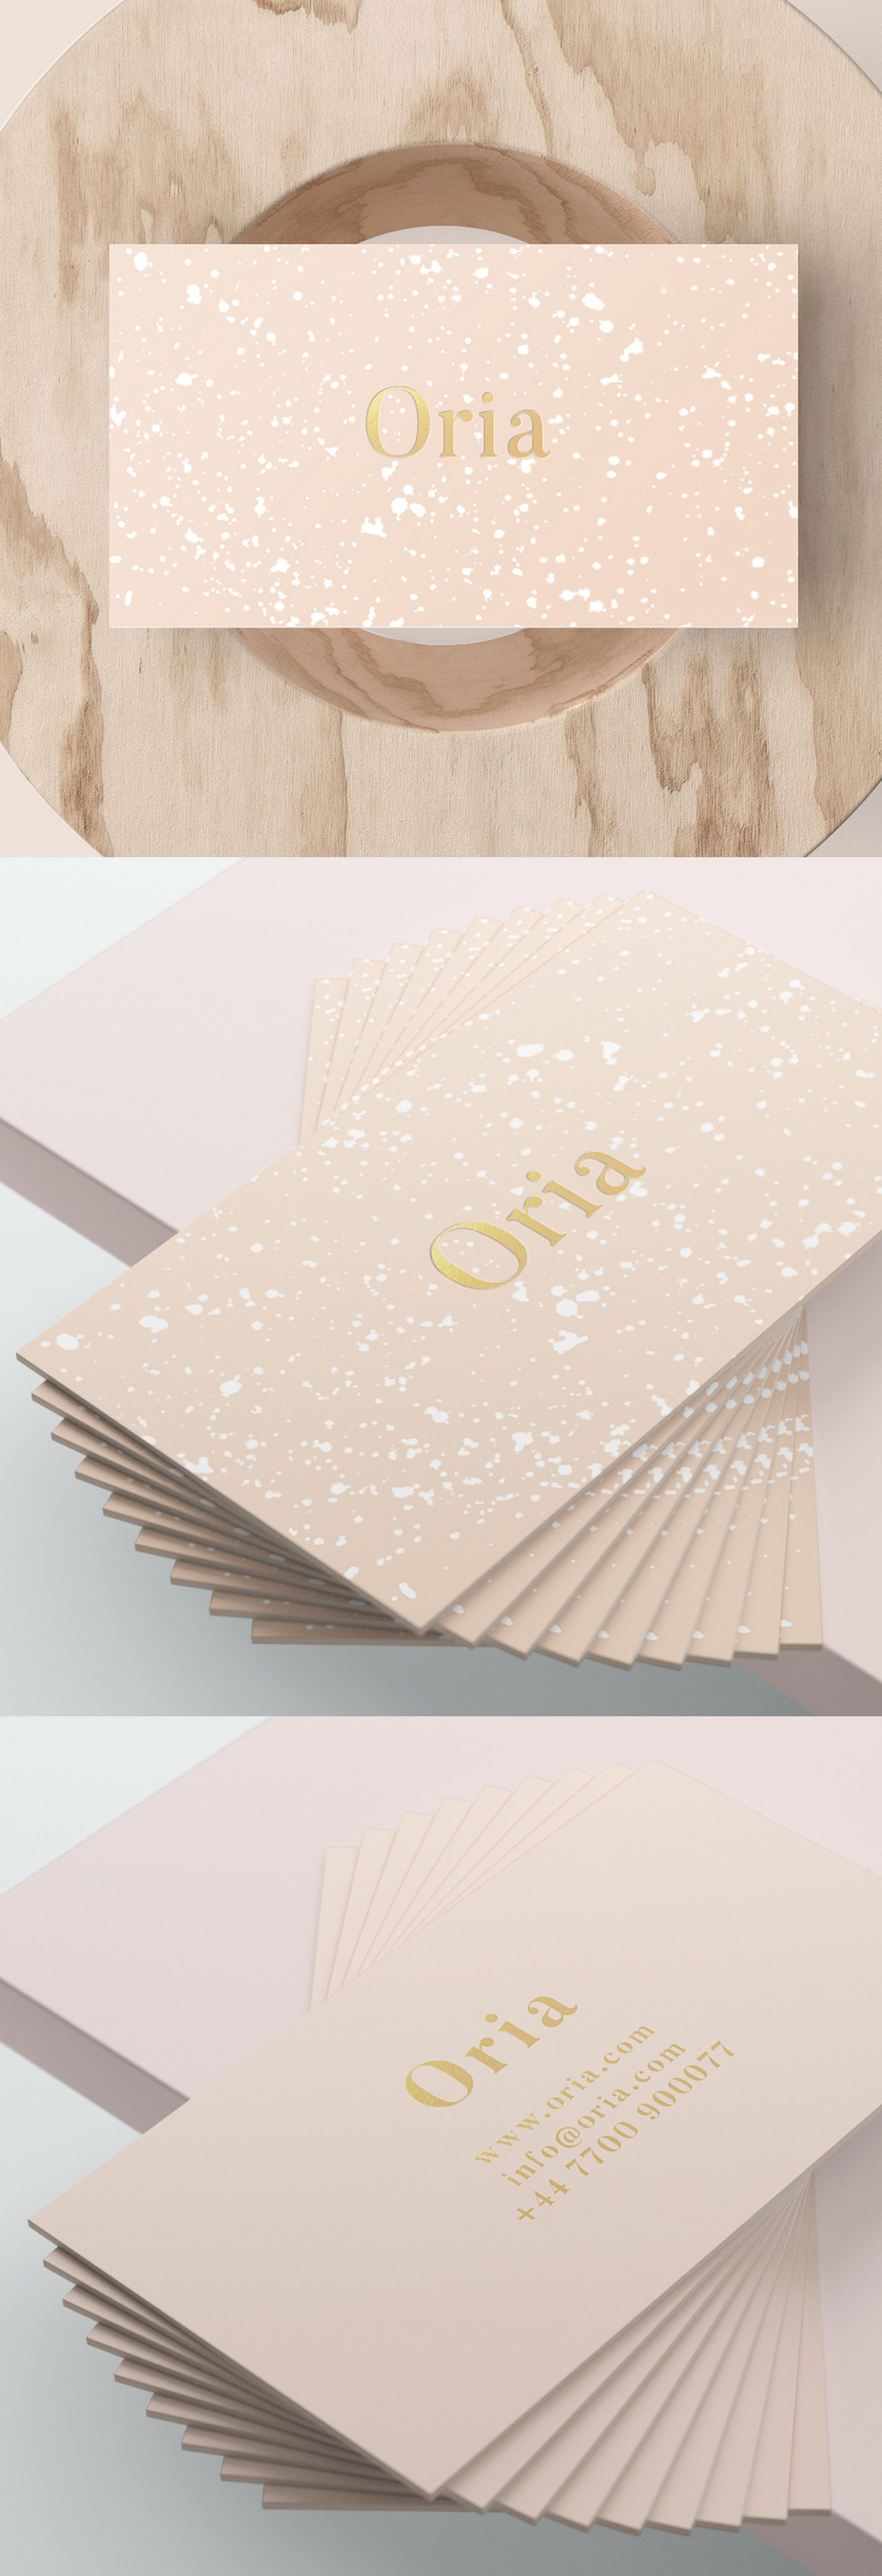 ORIA (Peach): Business Card | Serif, Fonts and Logos